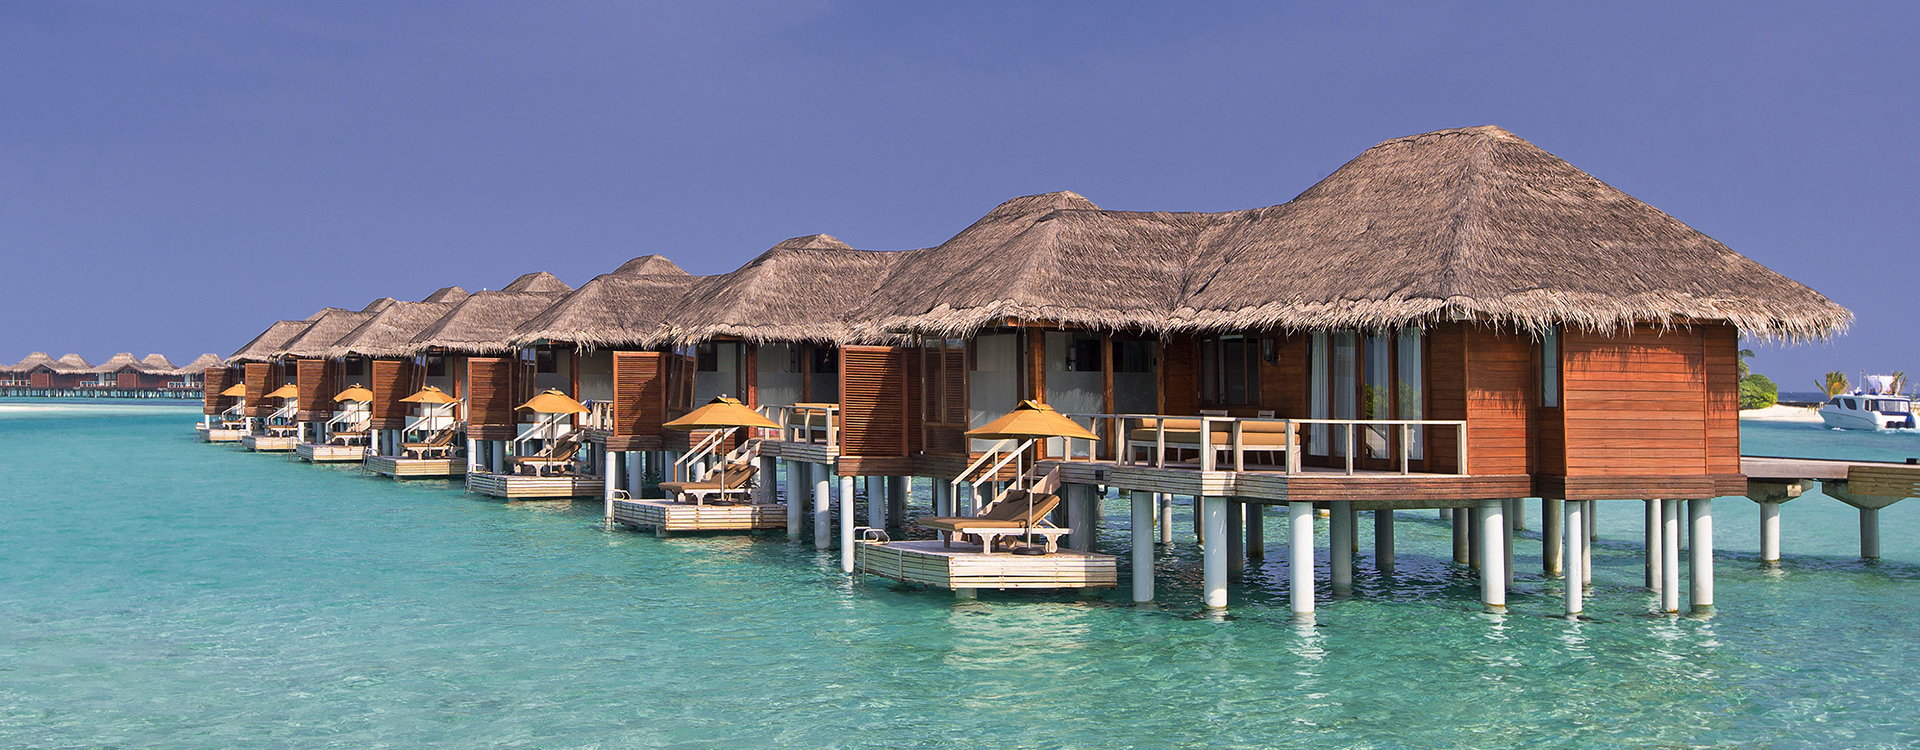 Anantara Veli Malediven